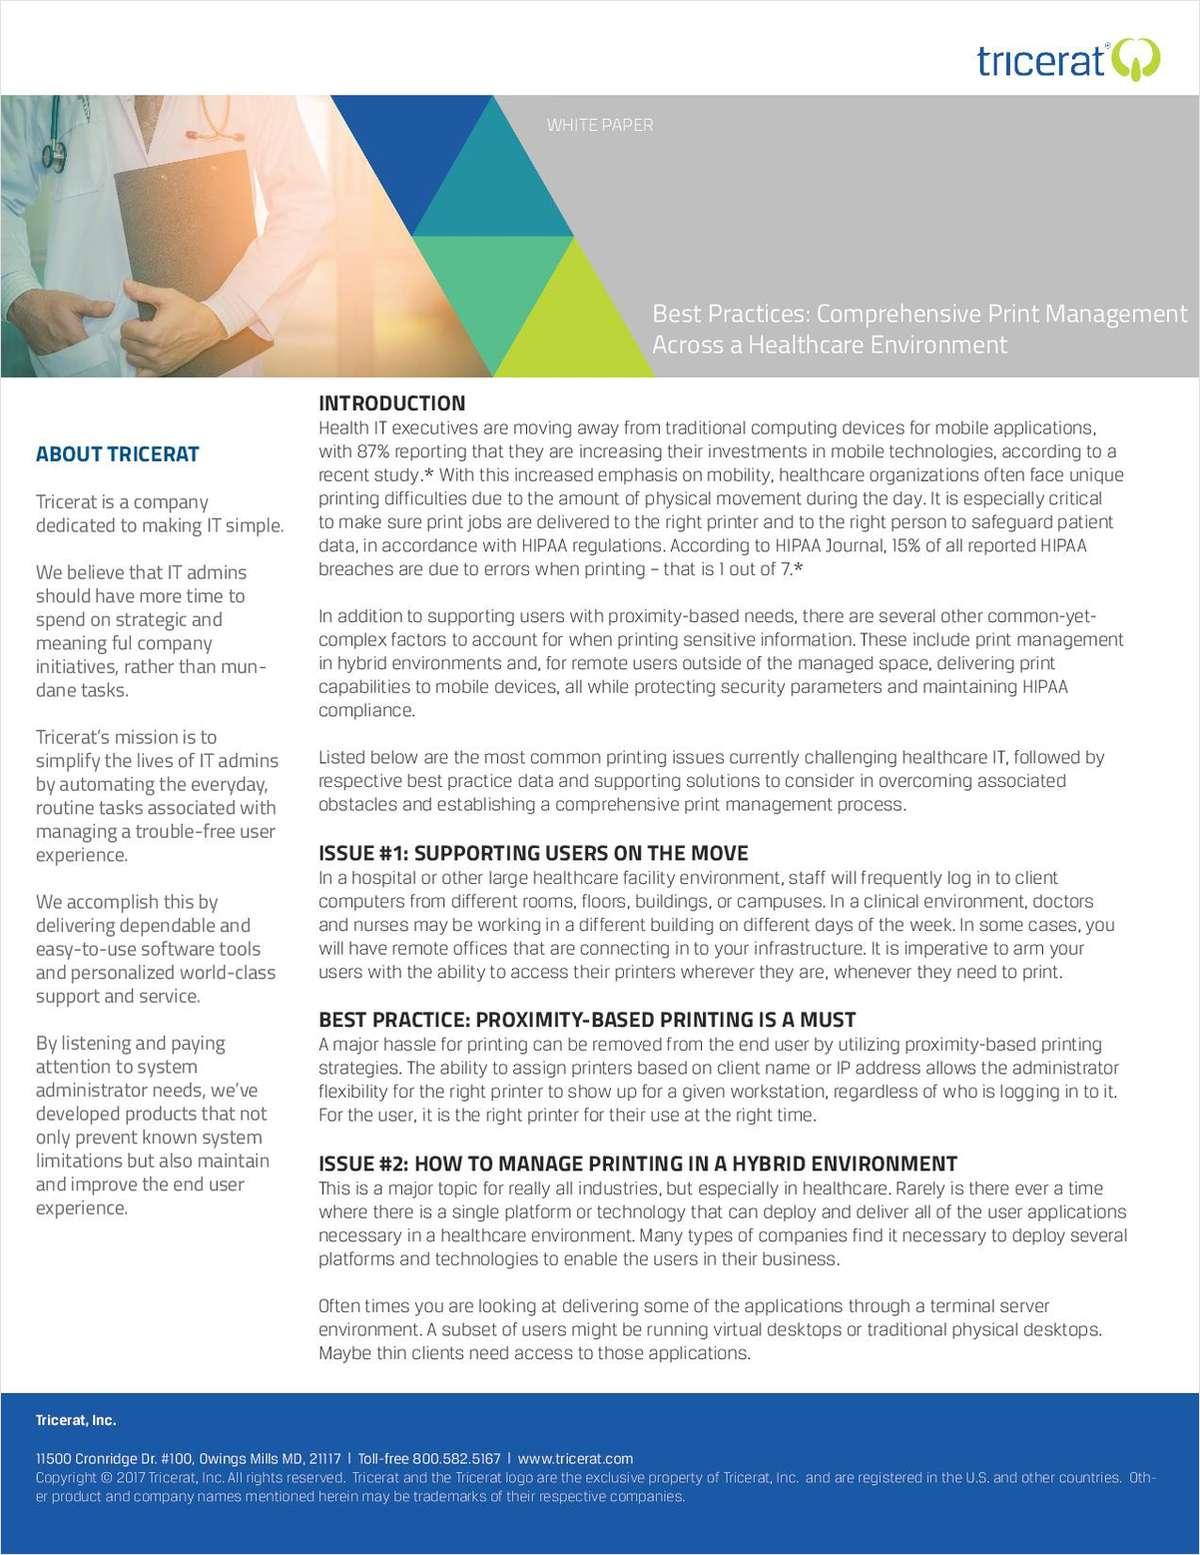 Best Practices: Comprehensive Print Management Across a Healthcare Environment